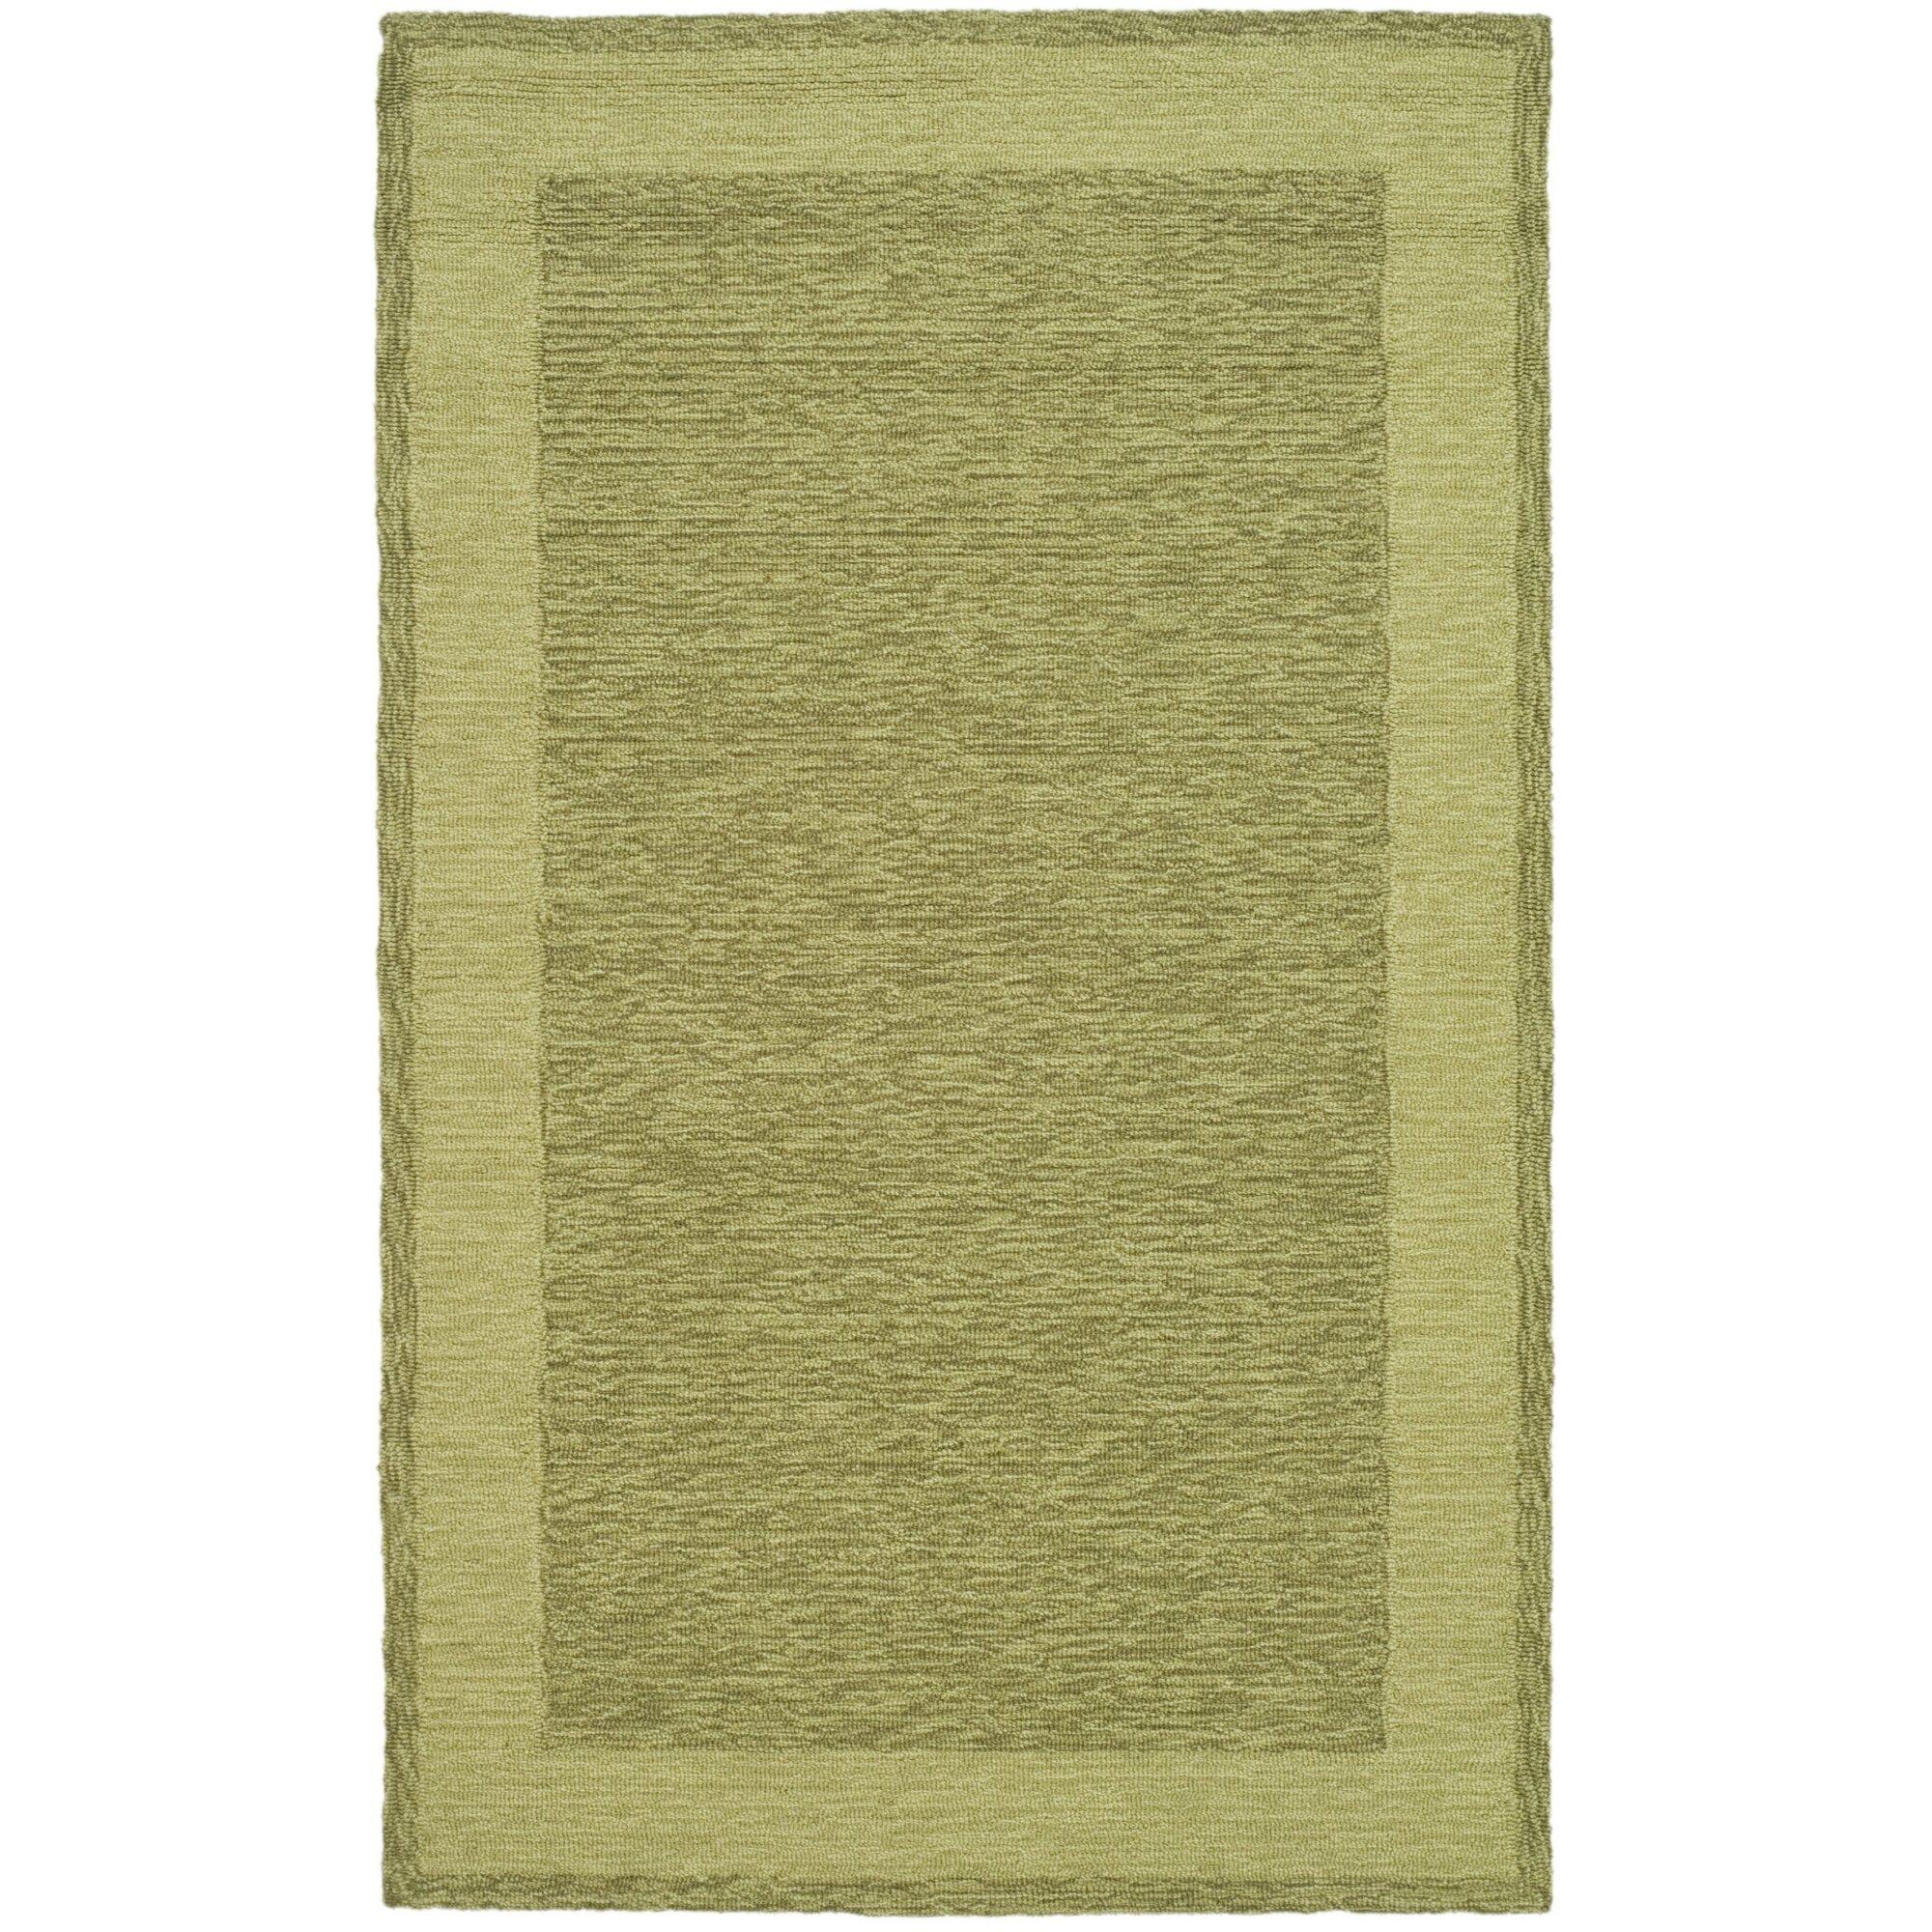 Safavieh durarug green area rug reviews wayfair for Safavieh rugs